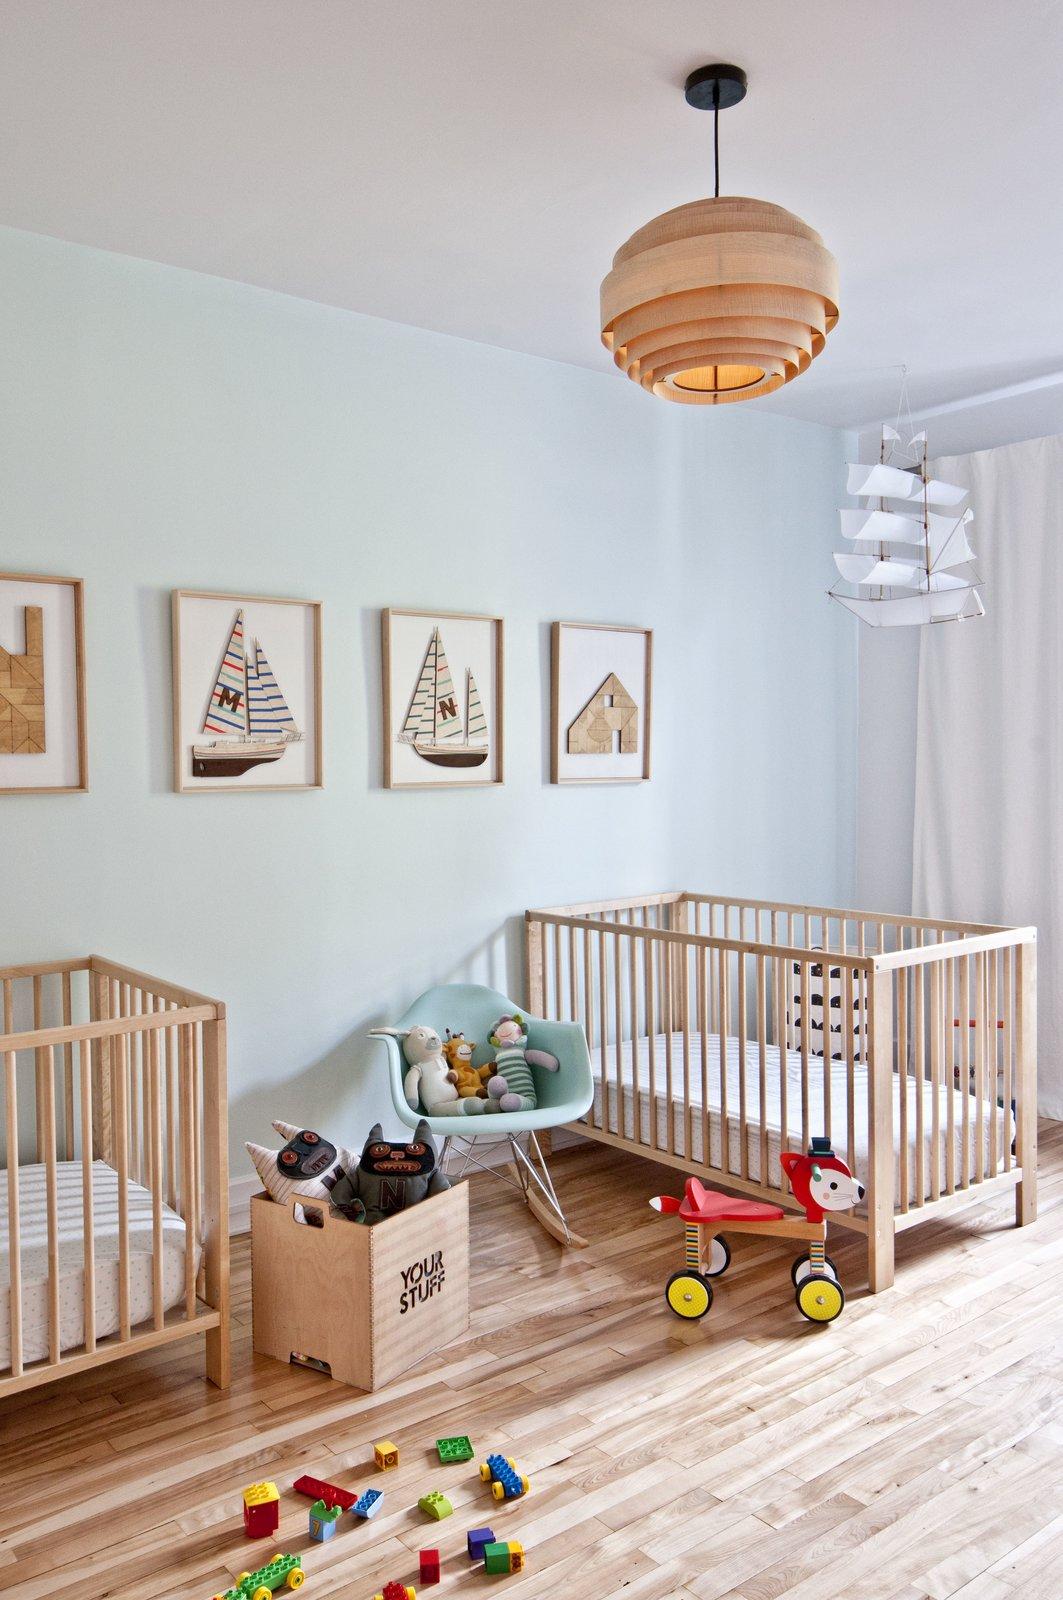 Kids Room, Light Hardwood Floor, Bedroom Room Type, Bed, Toddler Age, and Neutral Gender  Fabre Residence